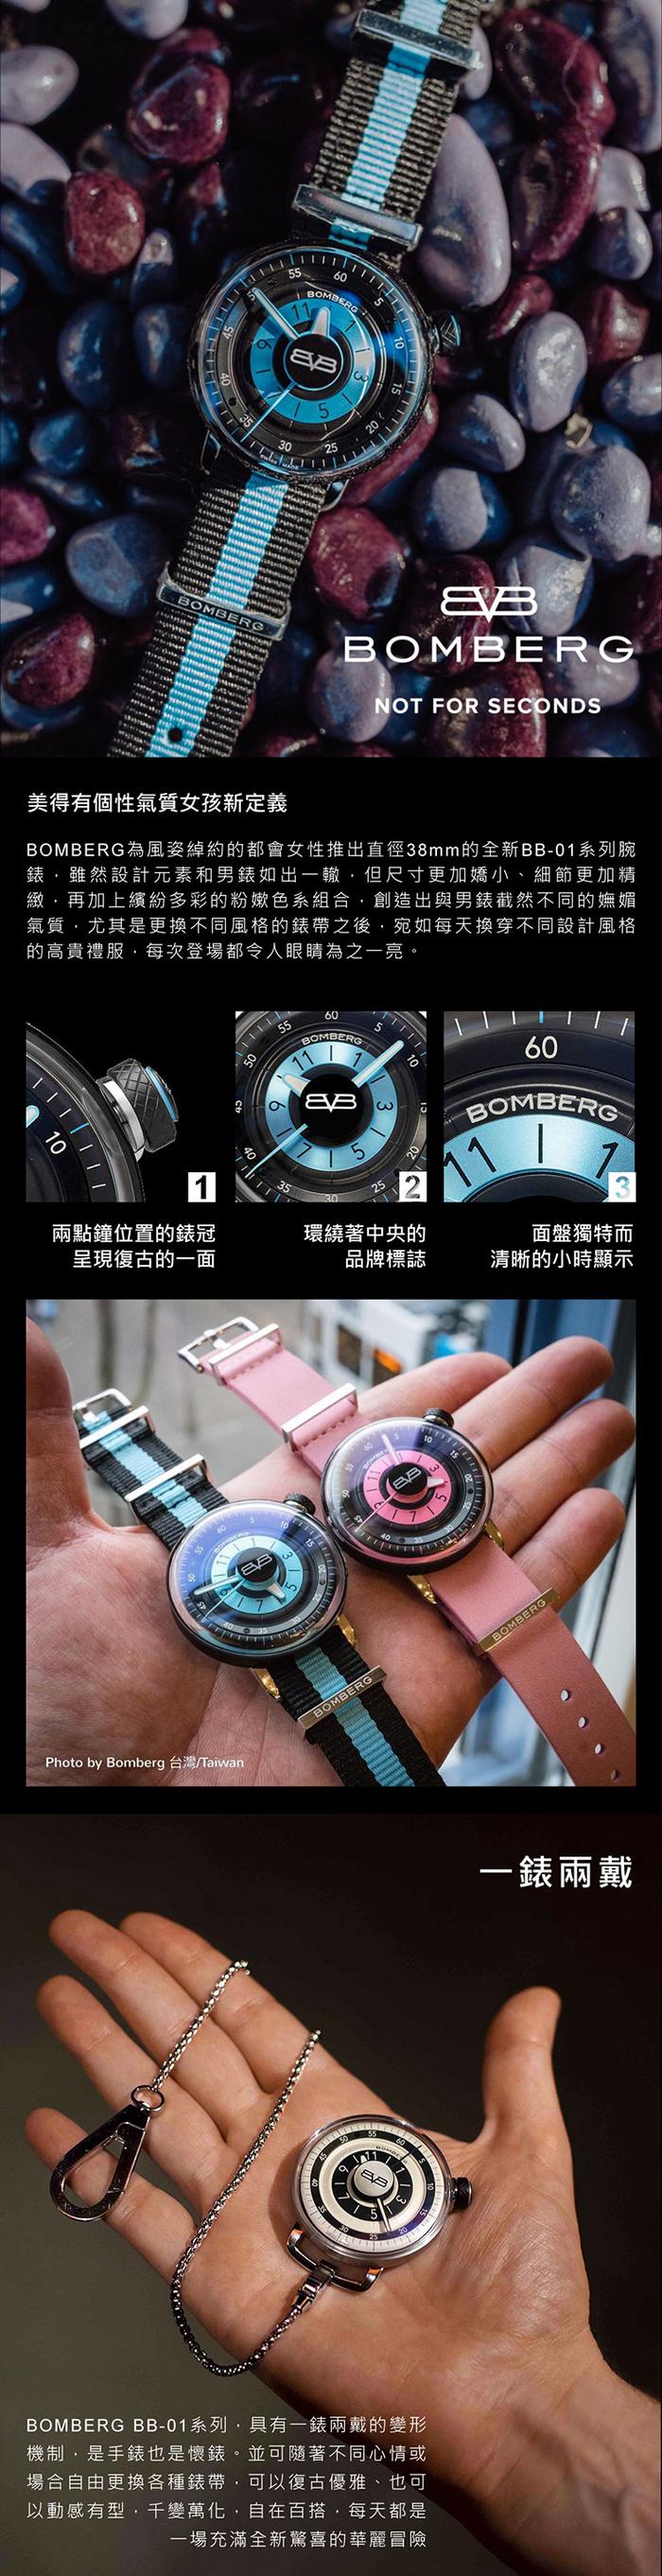 BOMBERG | BB-01 藍色帆布帶錶款 | 錶徑 38mm